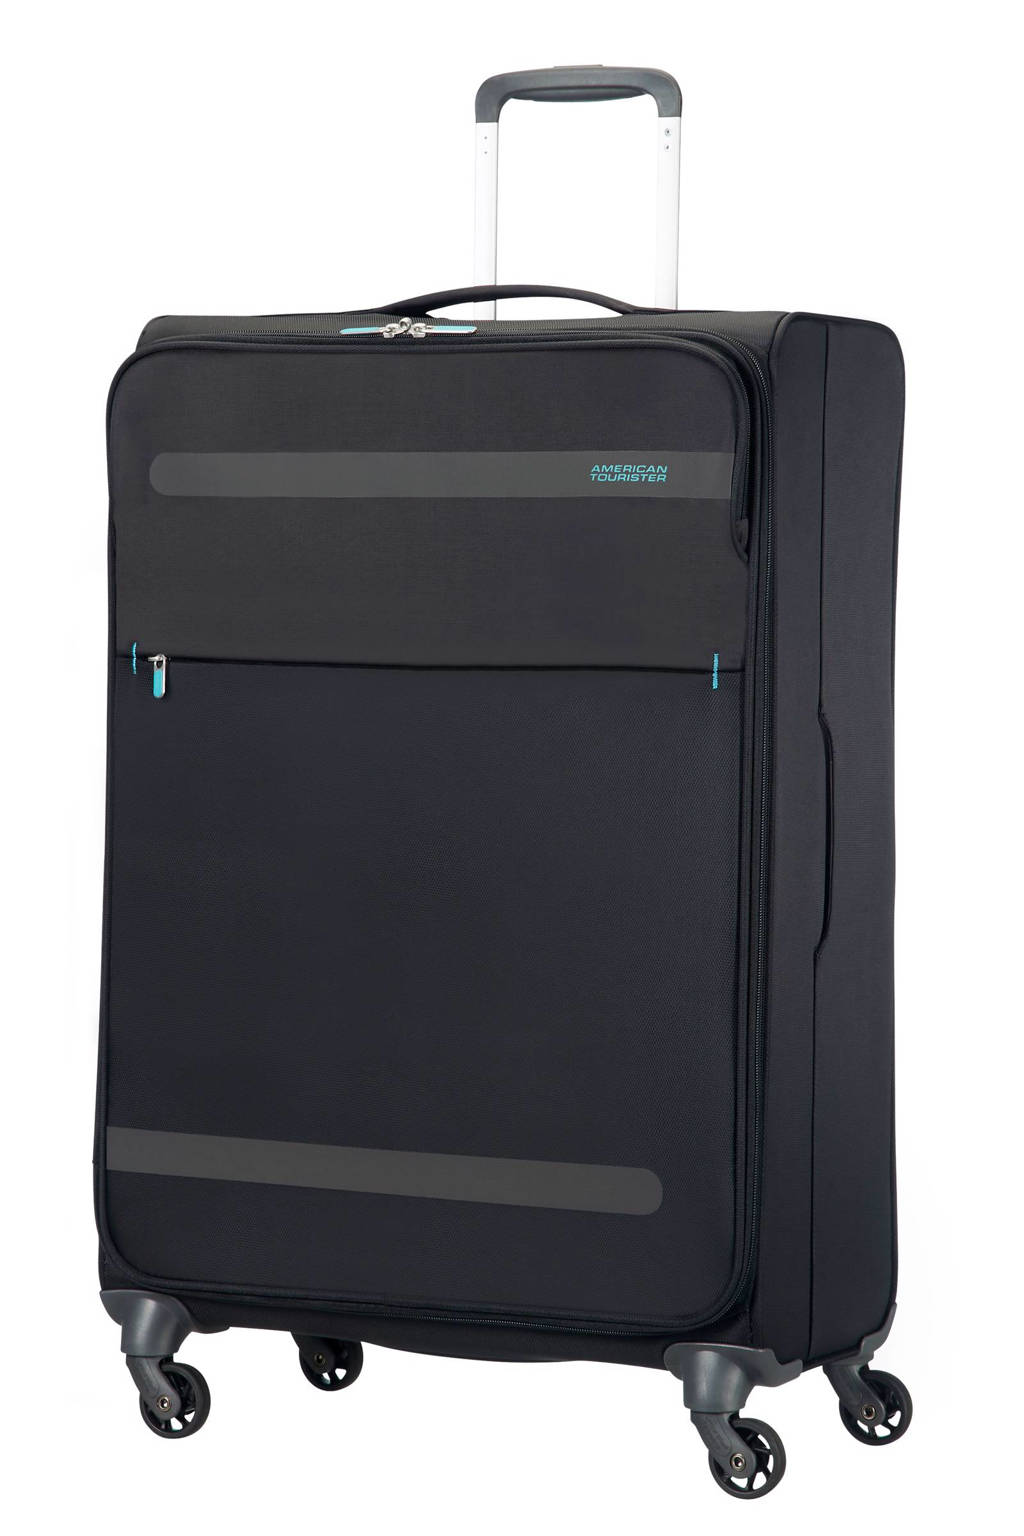 American Tourister HEROLITE SUPER LIGHT SPIN.74/27 koffer, 74x47x29, Vulcanic black